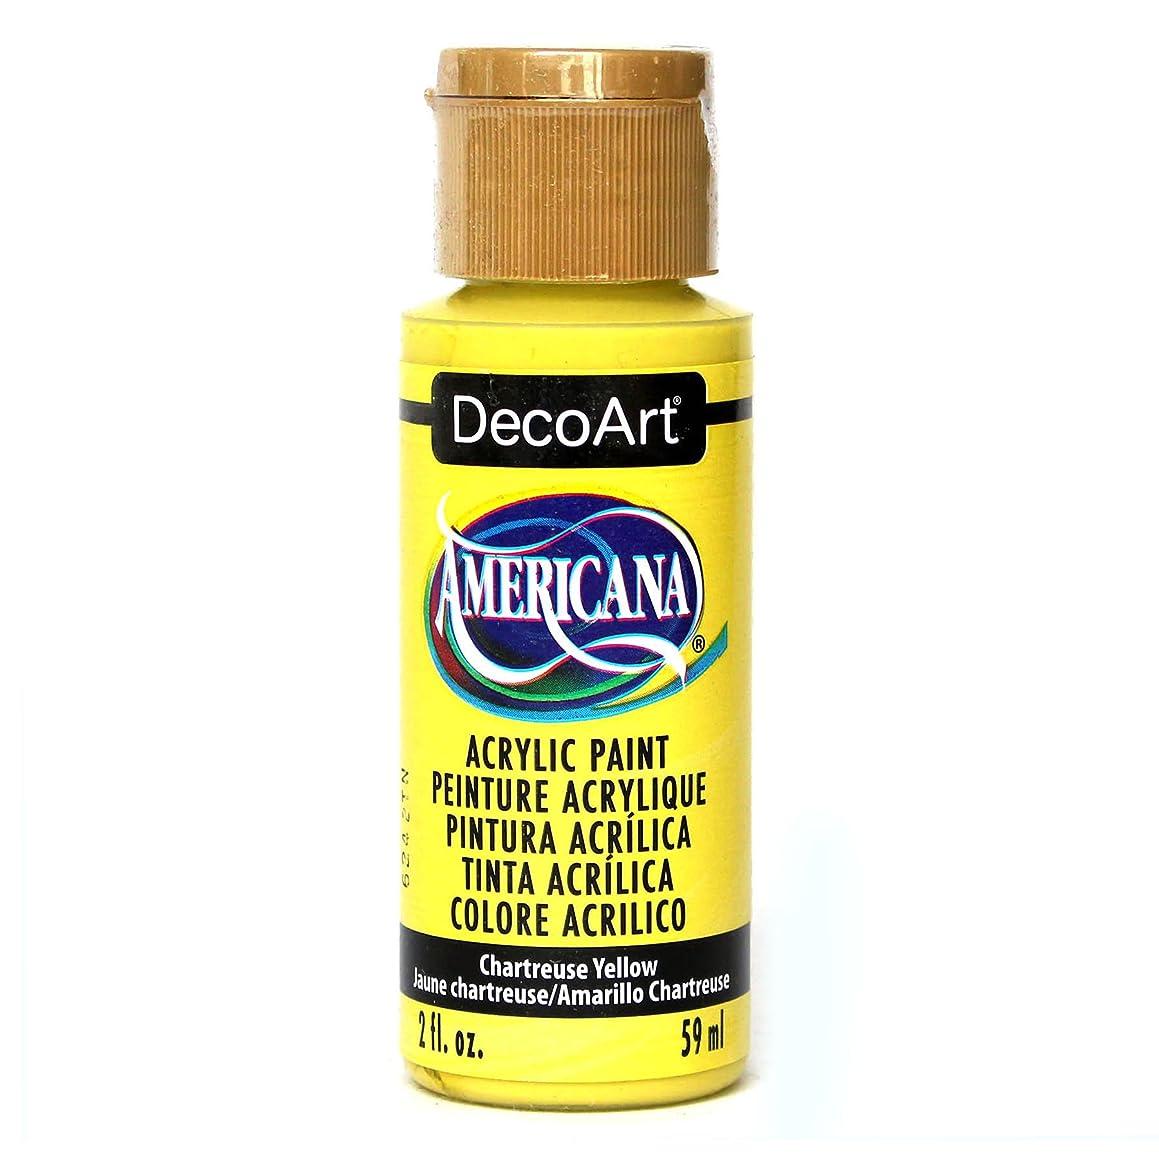 DecoArt Americana Acylic Chartreuse Yellow